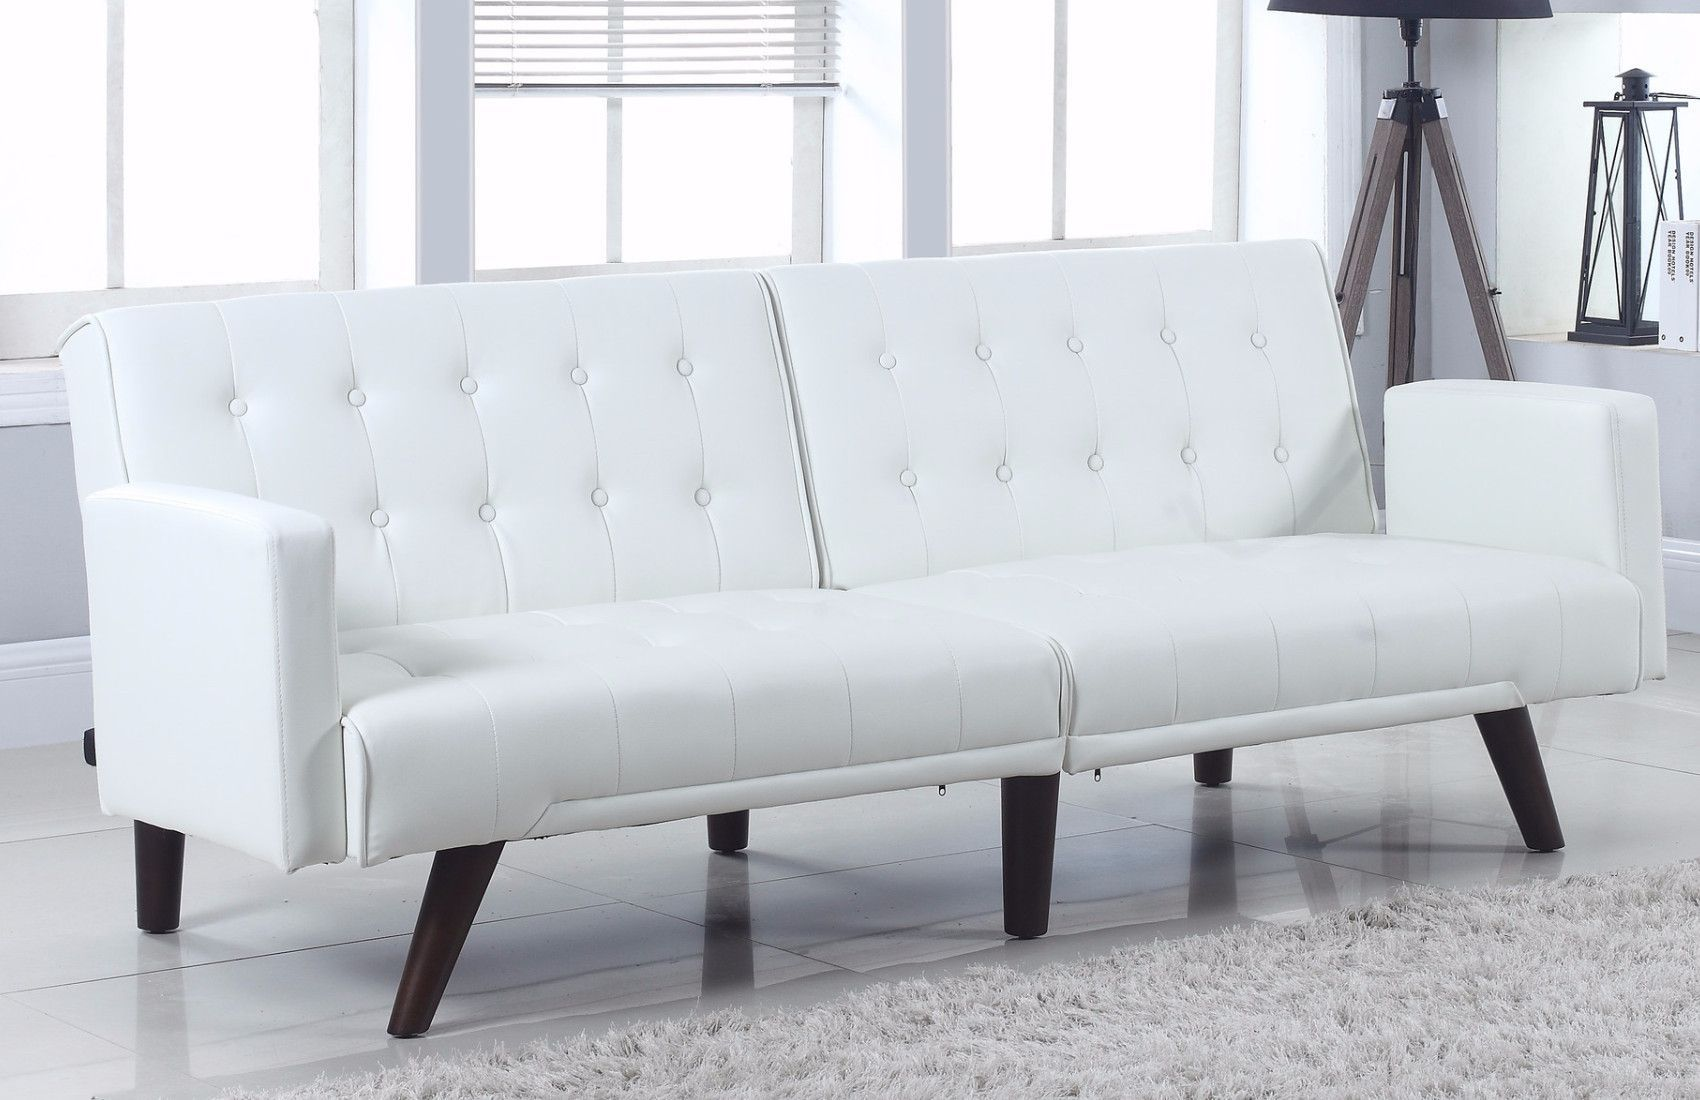 t35 mini modern white leather sectional sofa danish table sleeper small